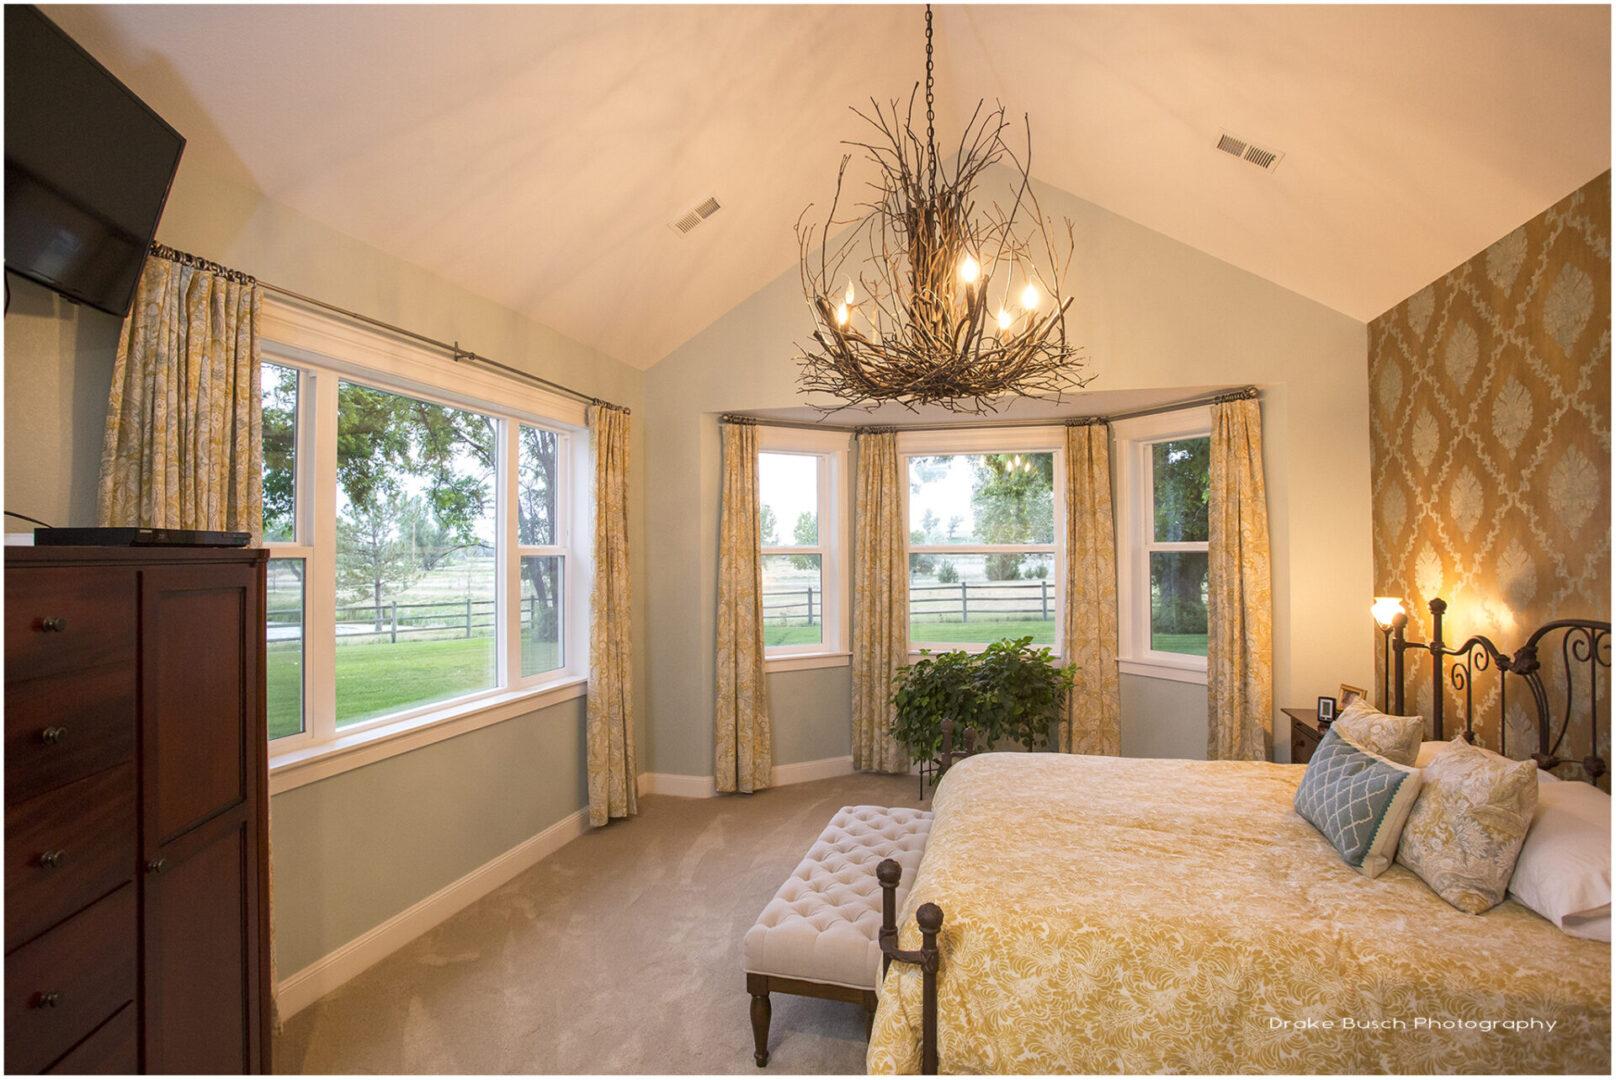 bedroom with twig chandelier